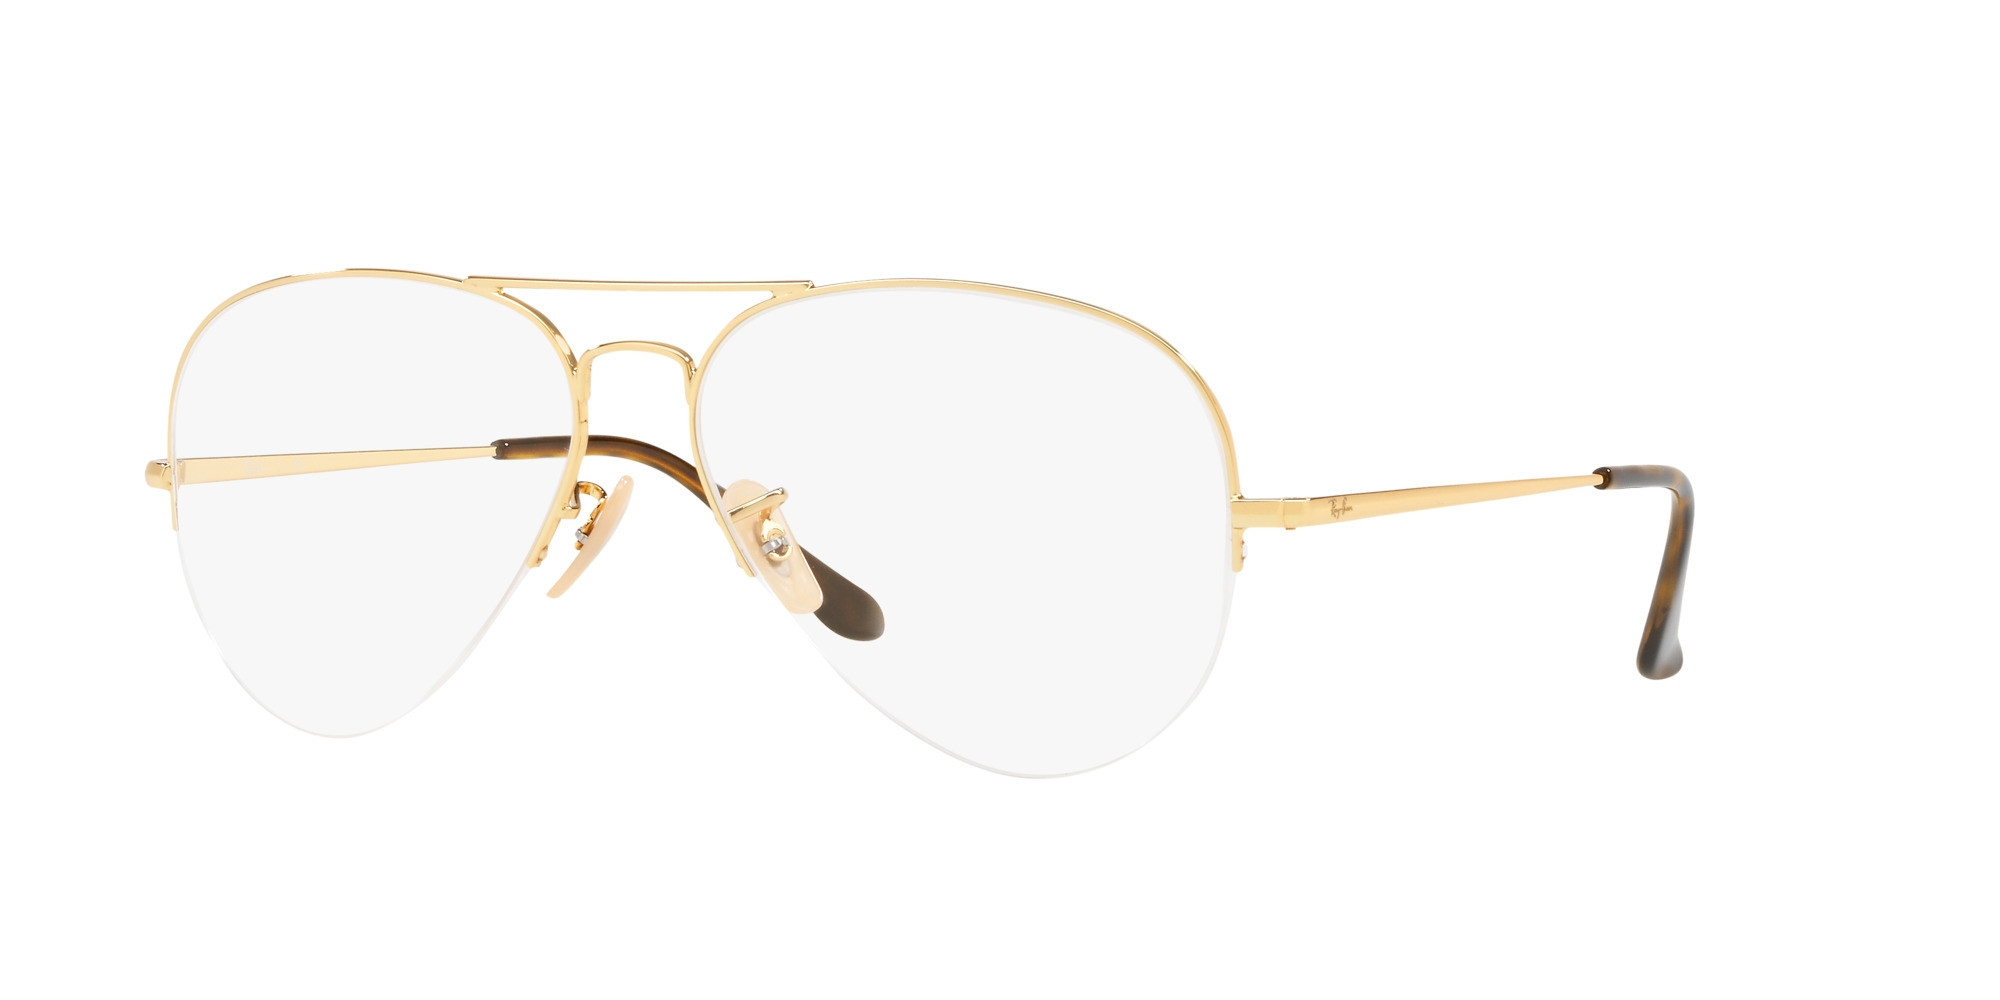 RX6589 2500 gafas gradudadas